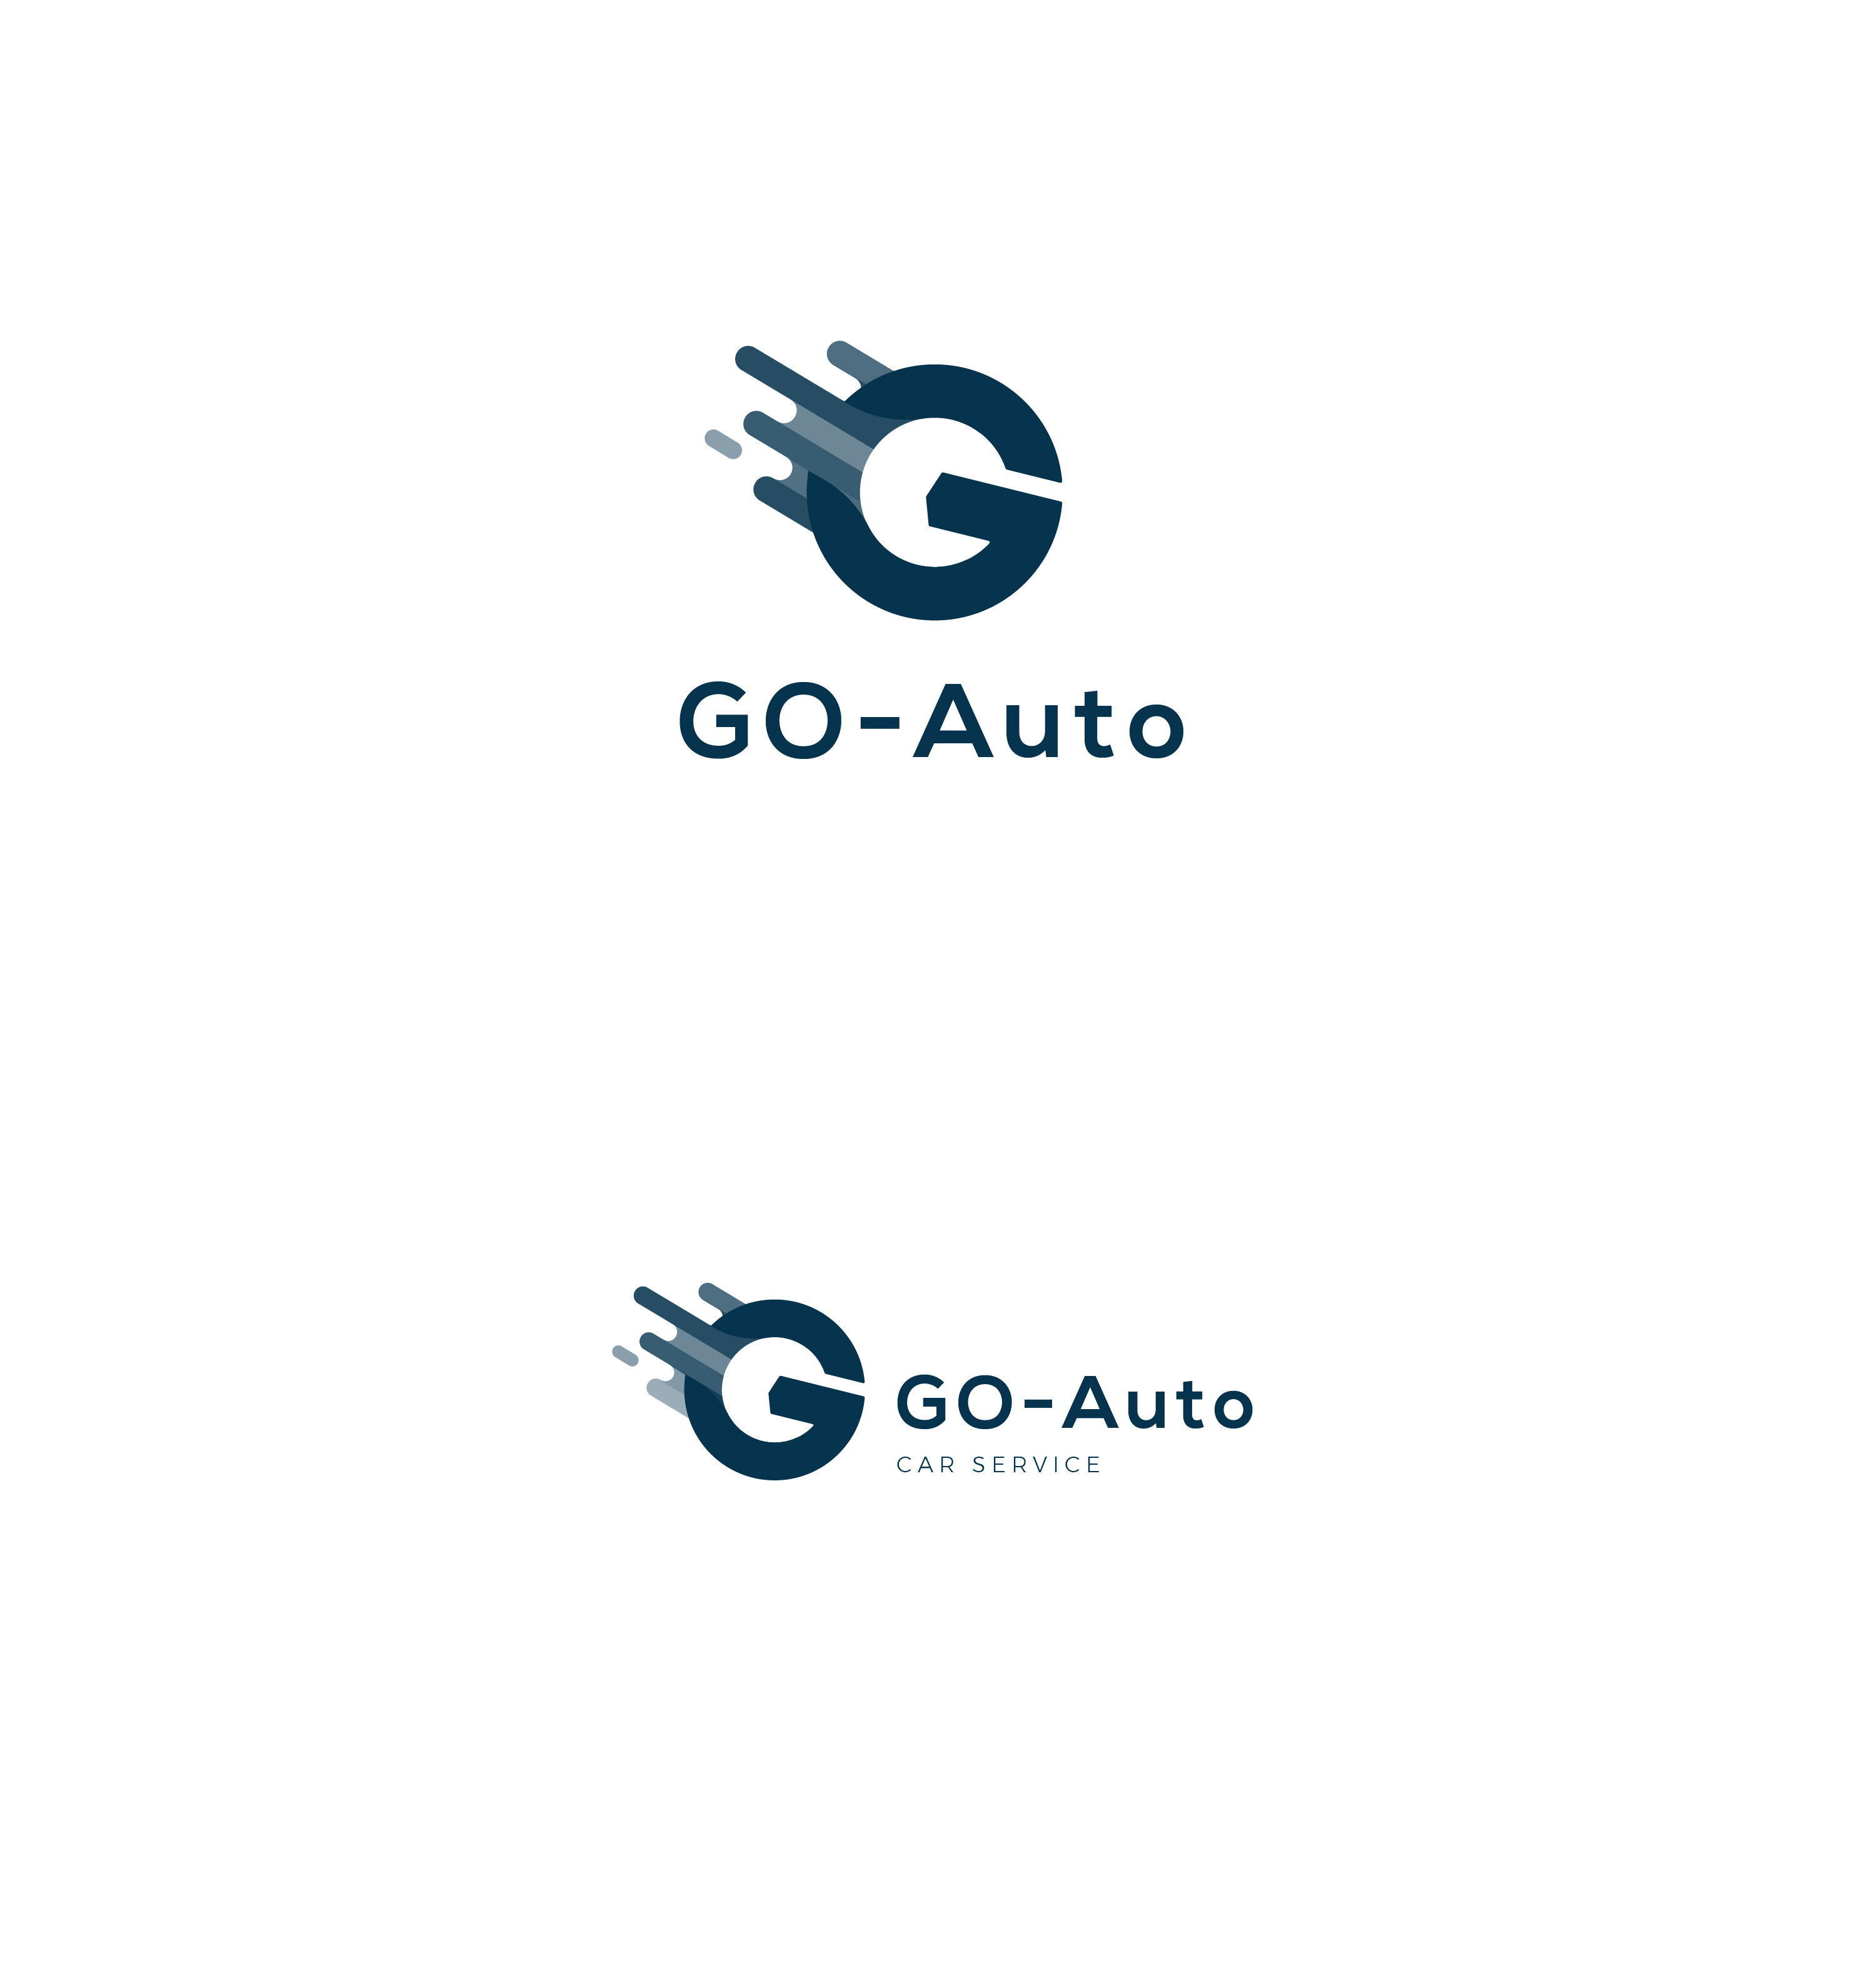 Letter G - Car Service Repair Logo example image 2